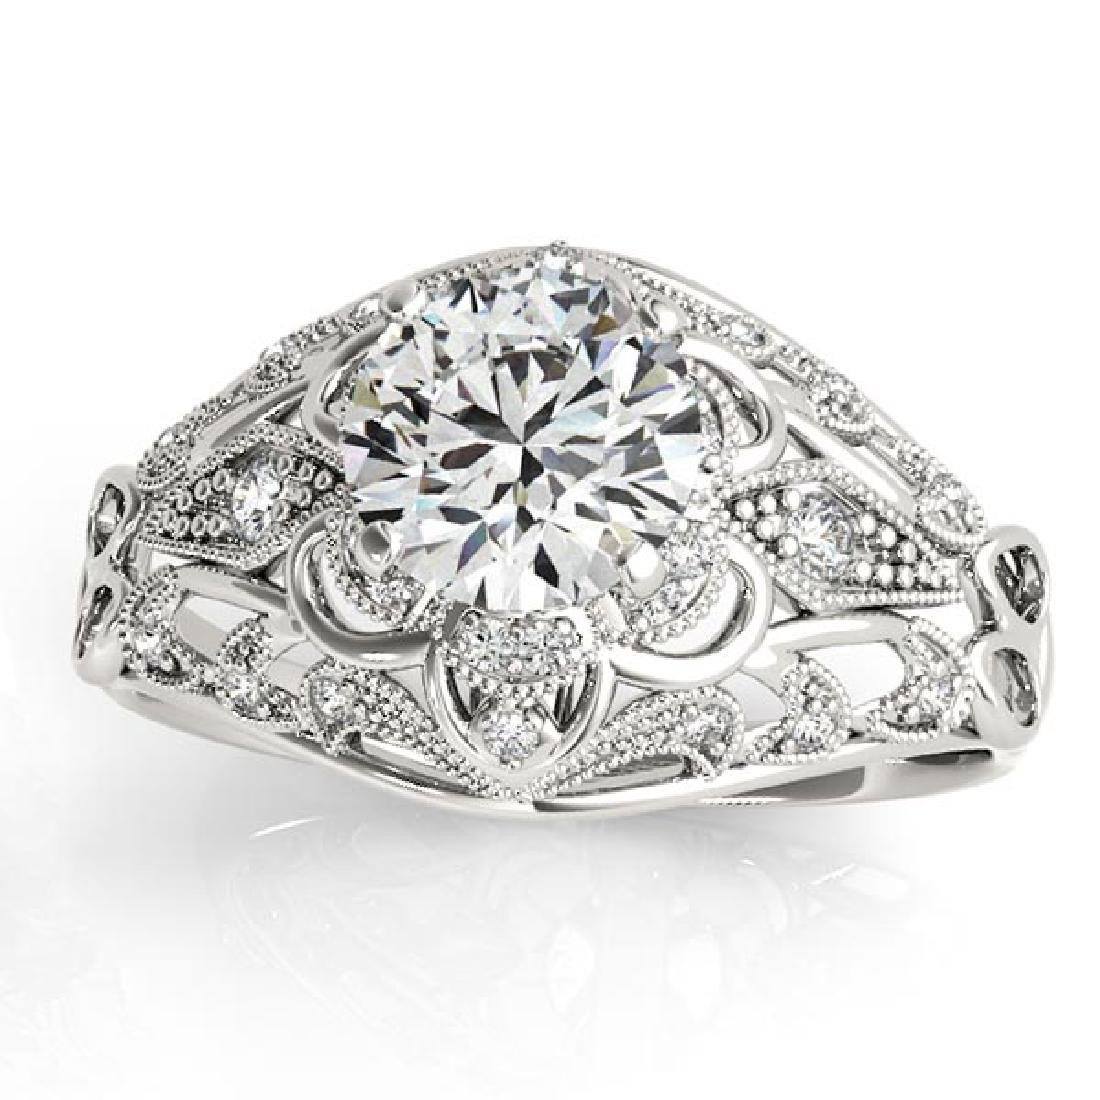 Vintage Art Deco Diamond Engagement Ring Setting 14k Wh